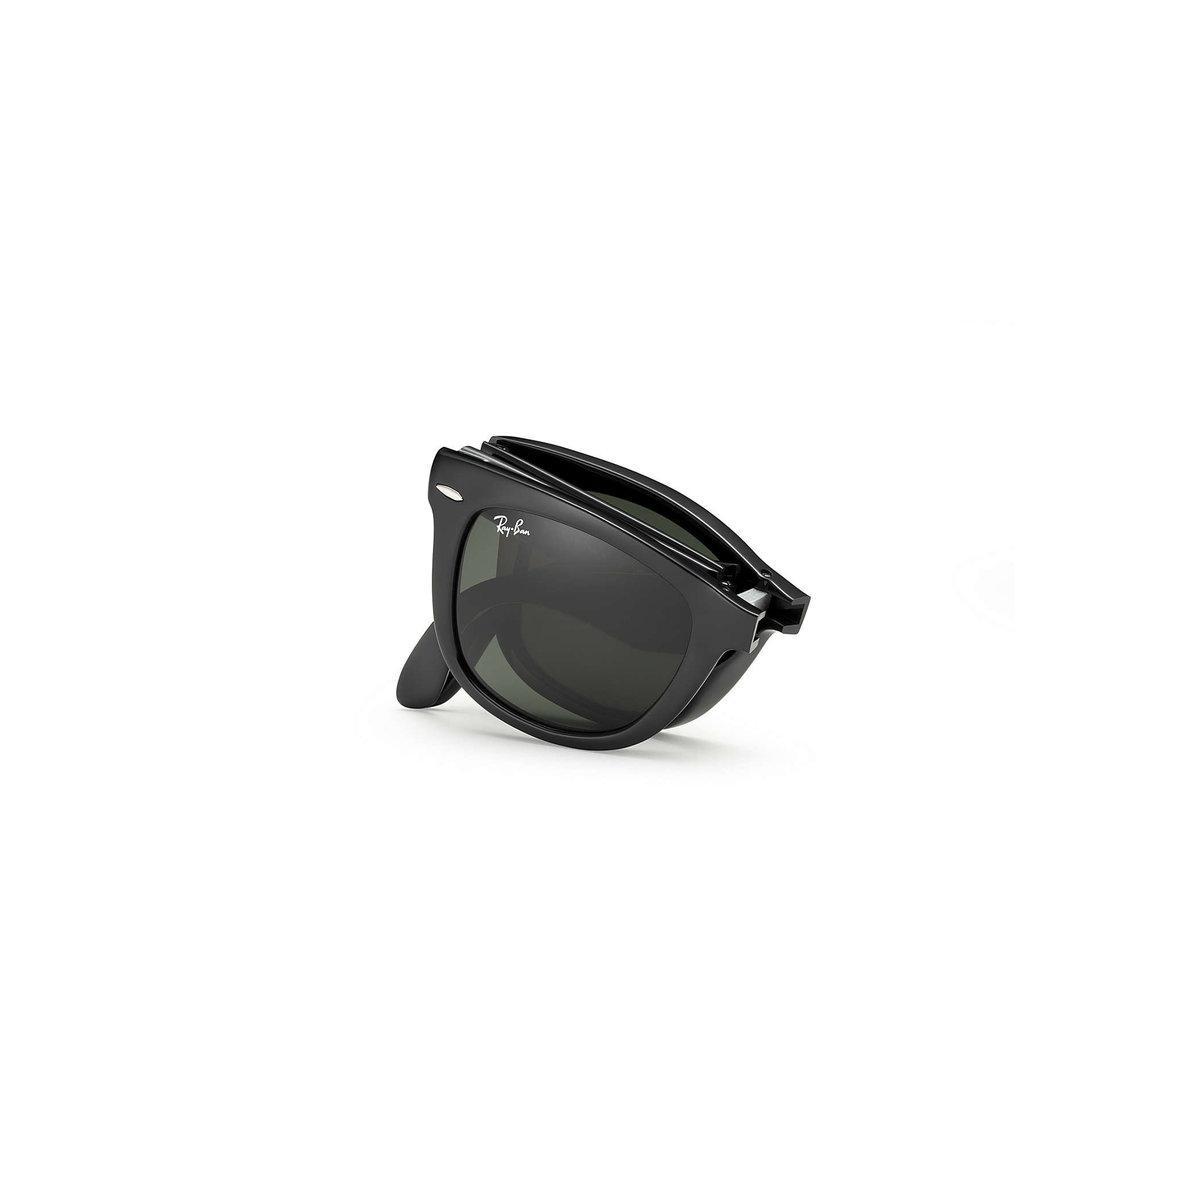 c402465902ee7 Ray-Ban - Black Wayfarer Folding Classic Sunglasses – Green Classic G-15  Lens. View fullscreen